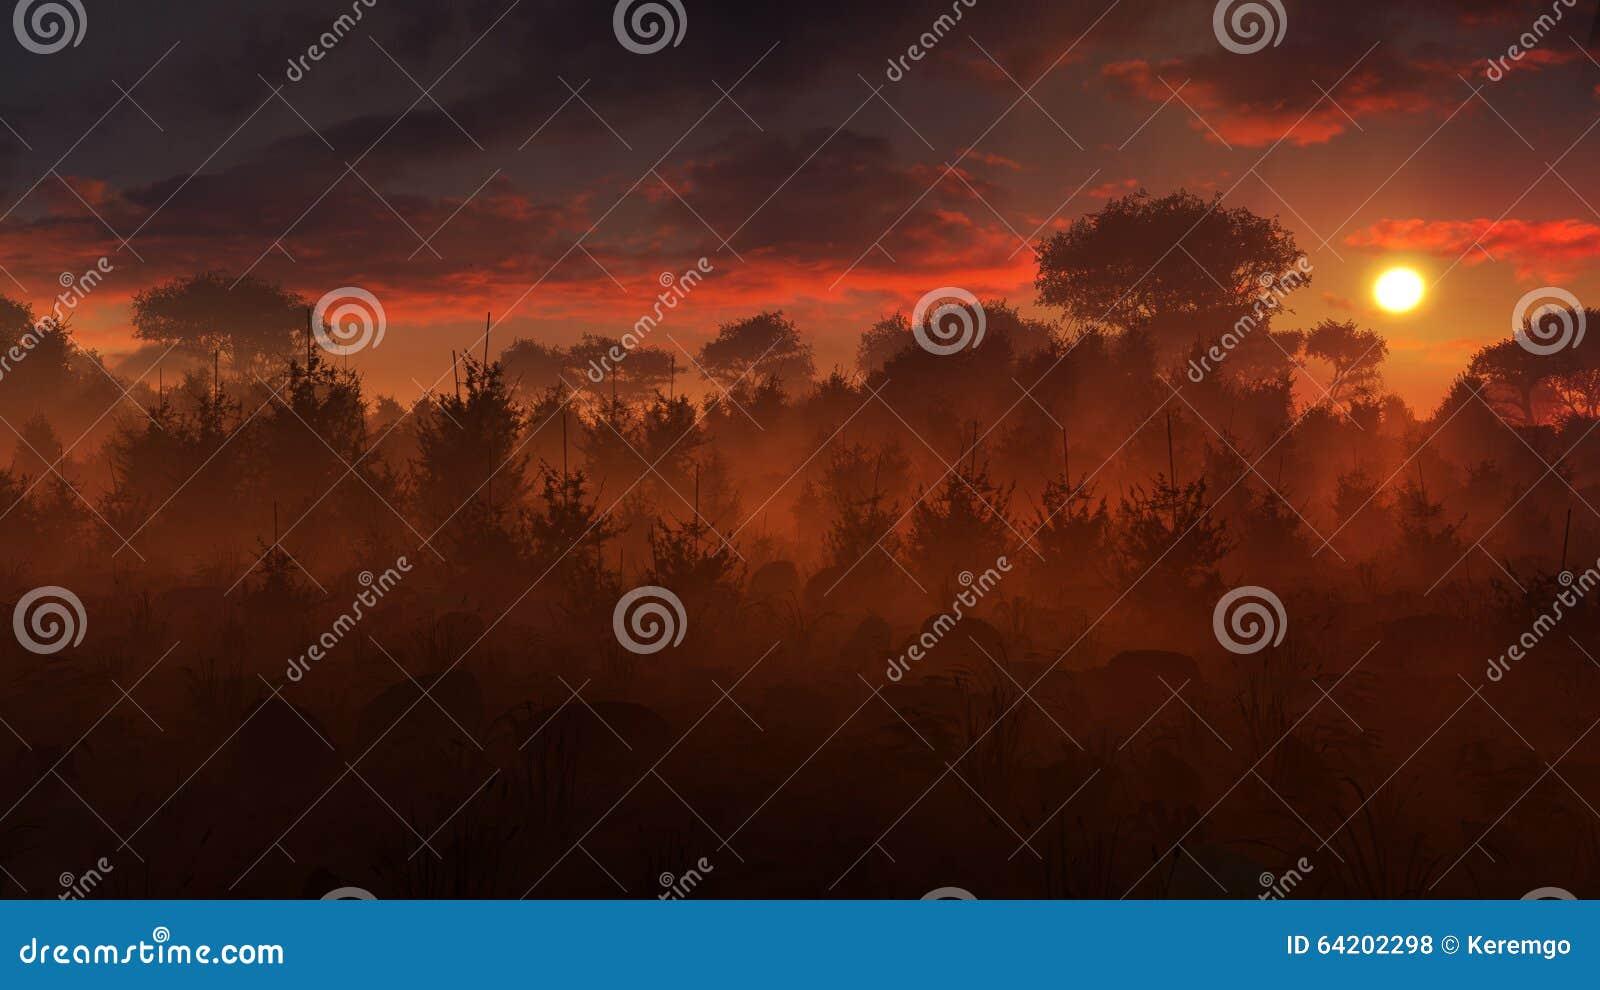 Mysterious Landscape Sunset